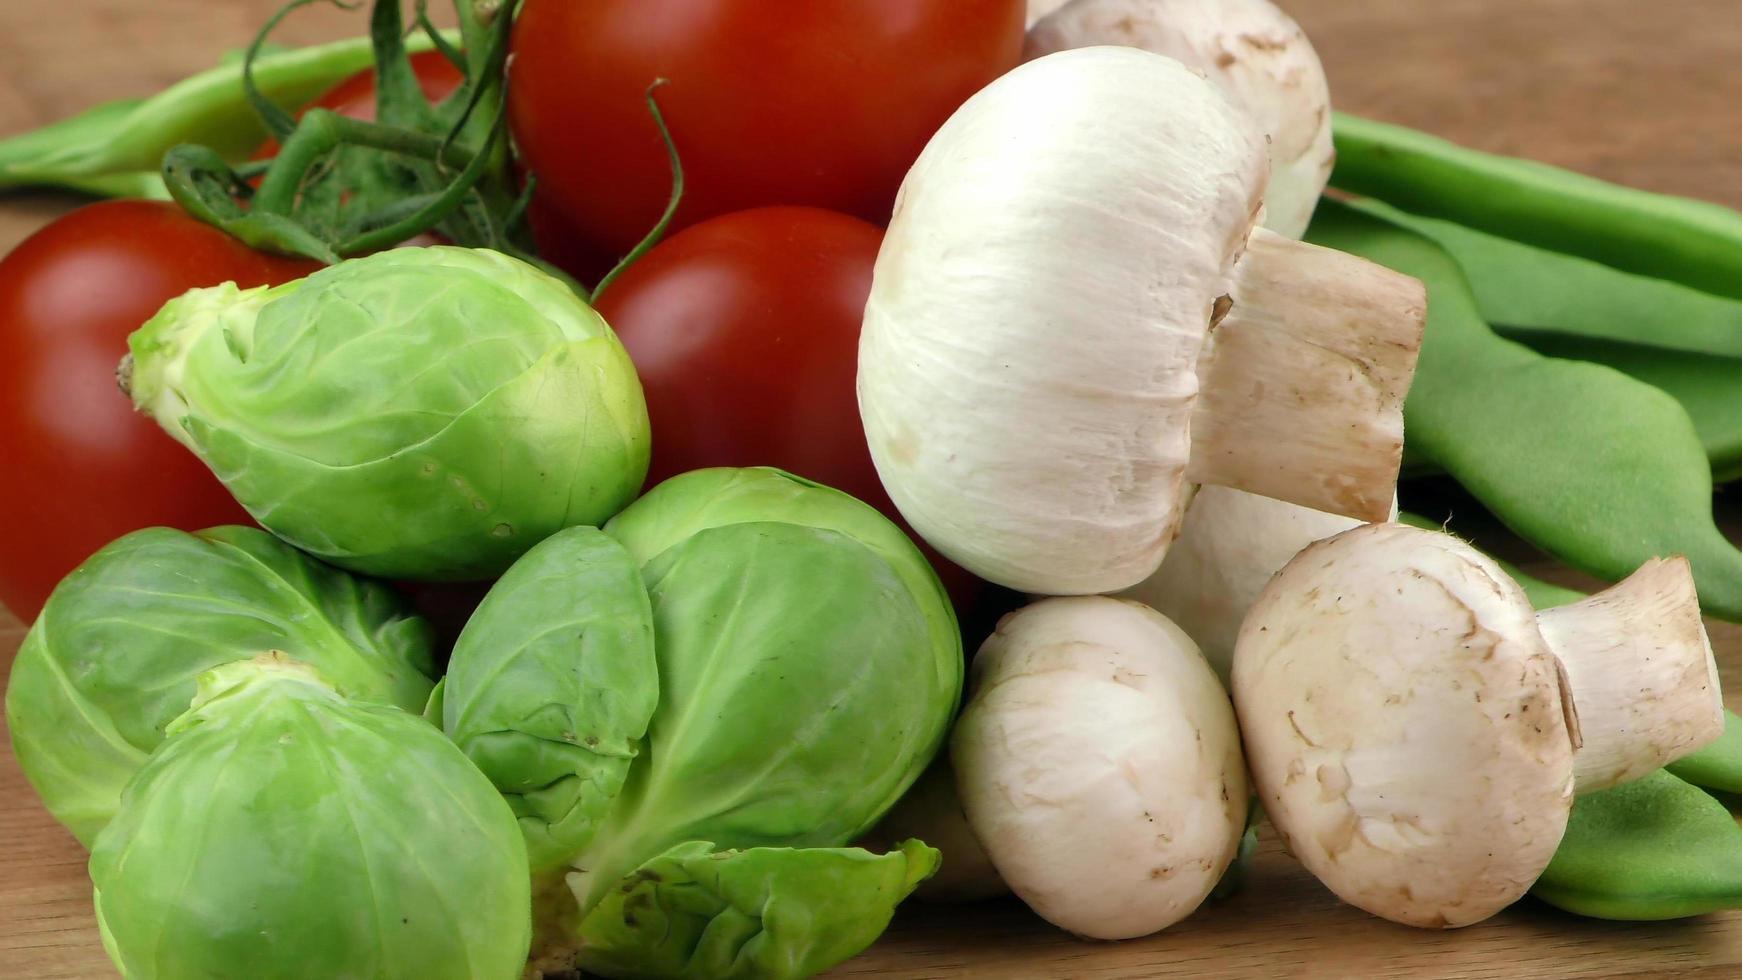 mezcla de vegetales orgánicos saludables foto